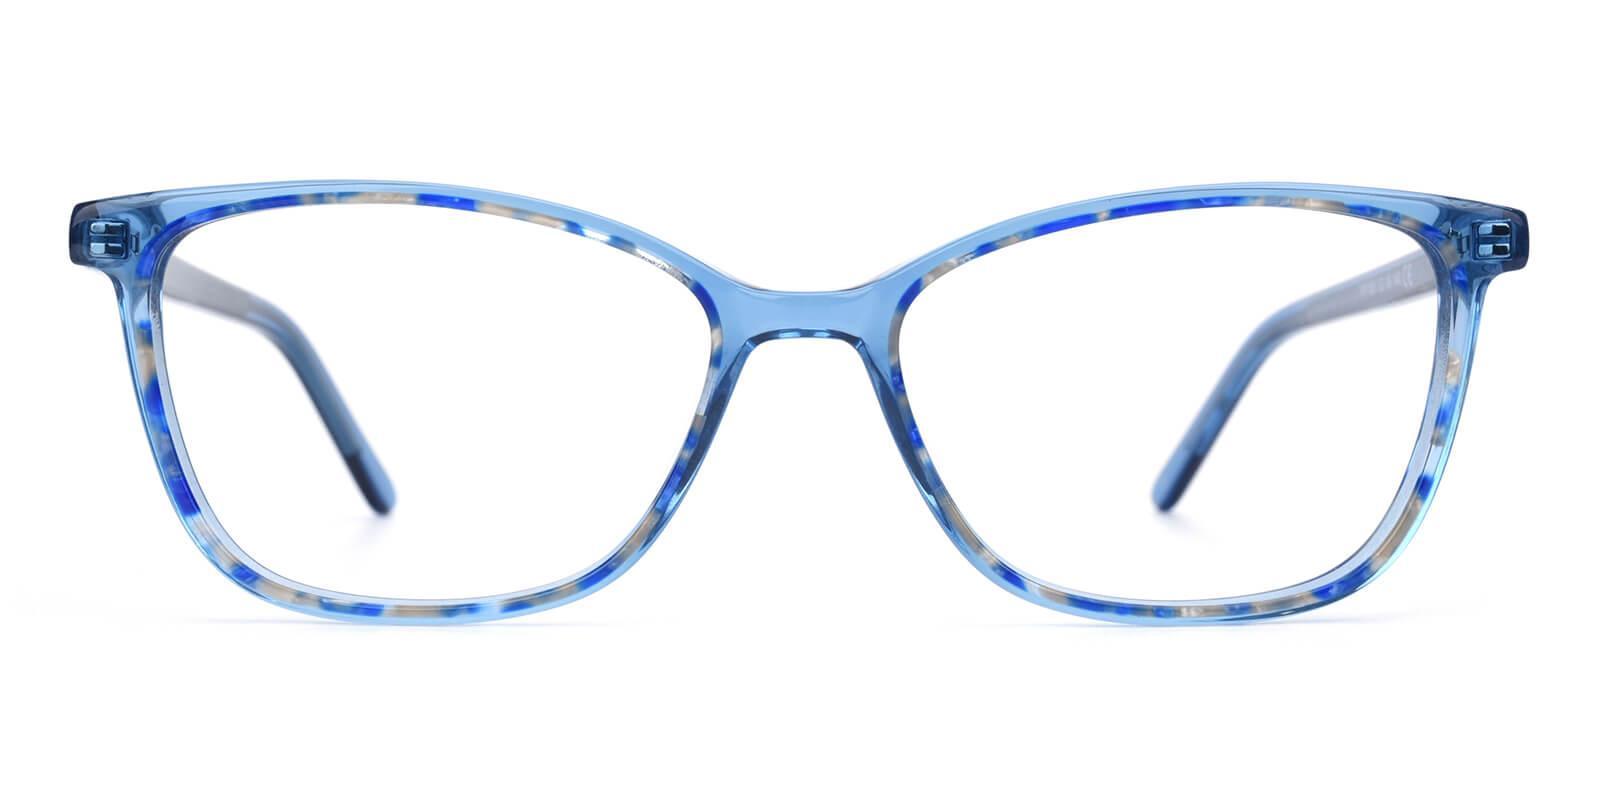 Darleney-Blue-Cat-Acetate-Eyeglasses-additional2